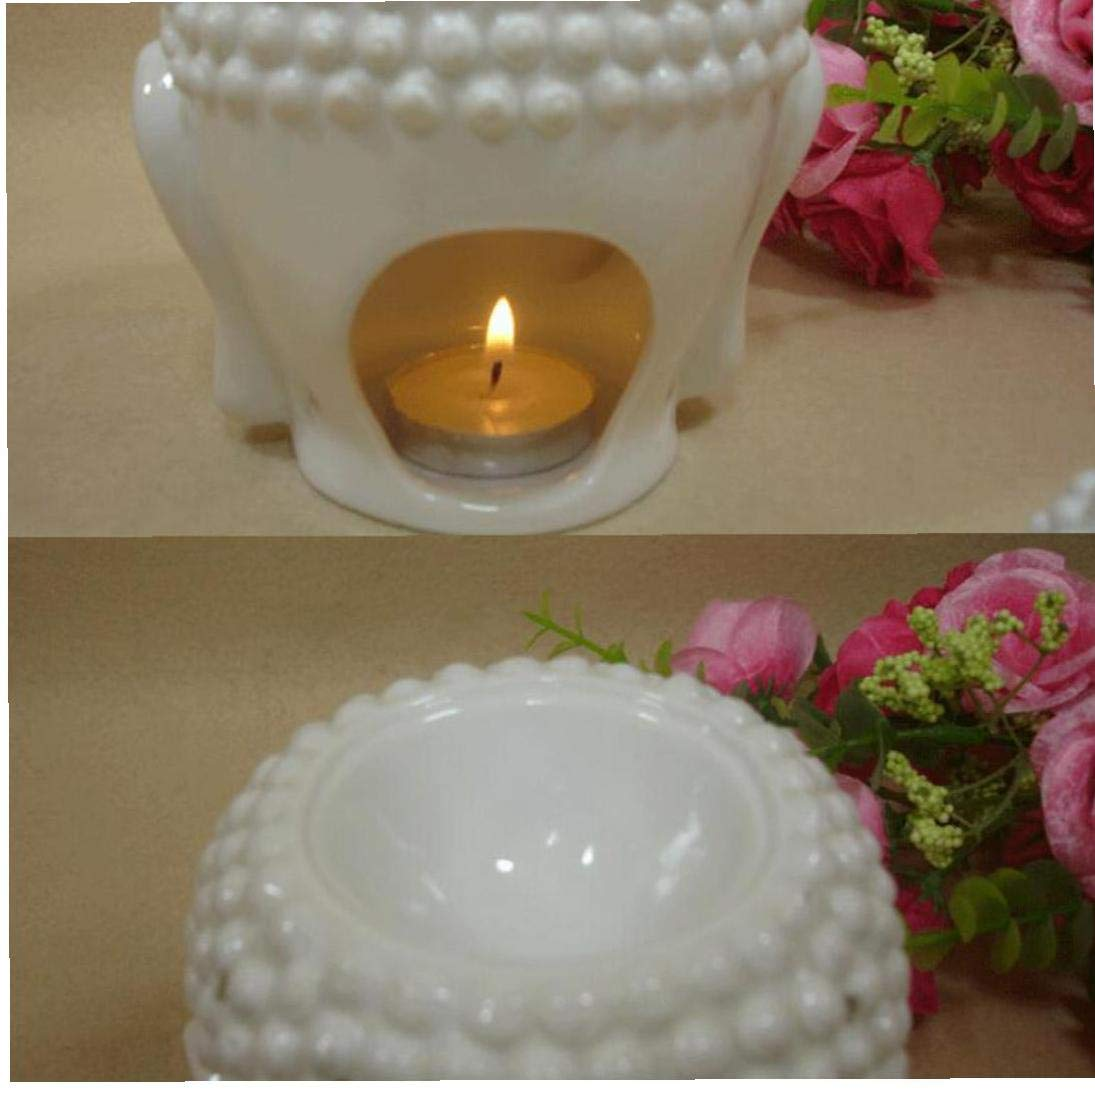 IUwnHceE 1pcs Ceramic Buddha Head Essential Oil Burner Translucent Ceramic Aromatherapy Diffusers Tealight Candle Holders Buddha Ornament for Yoga Spa House Decor White